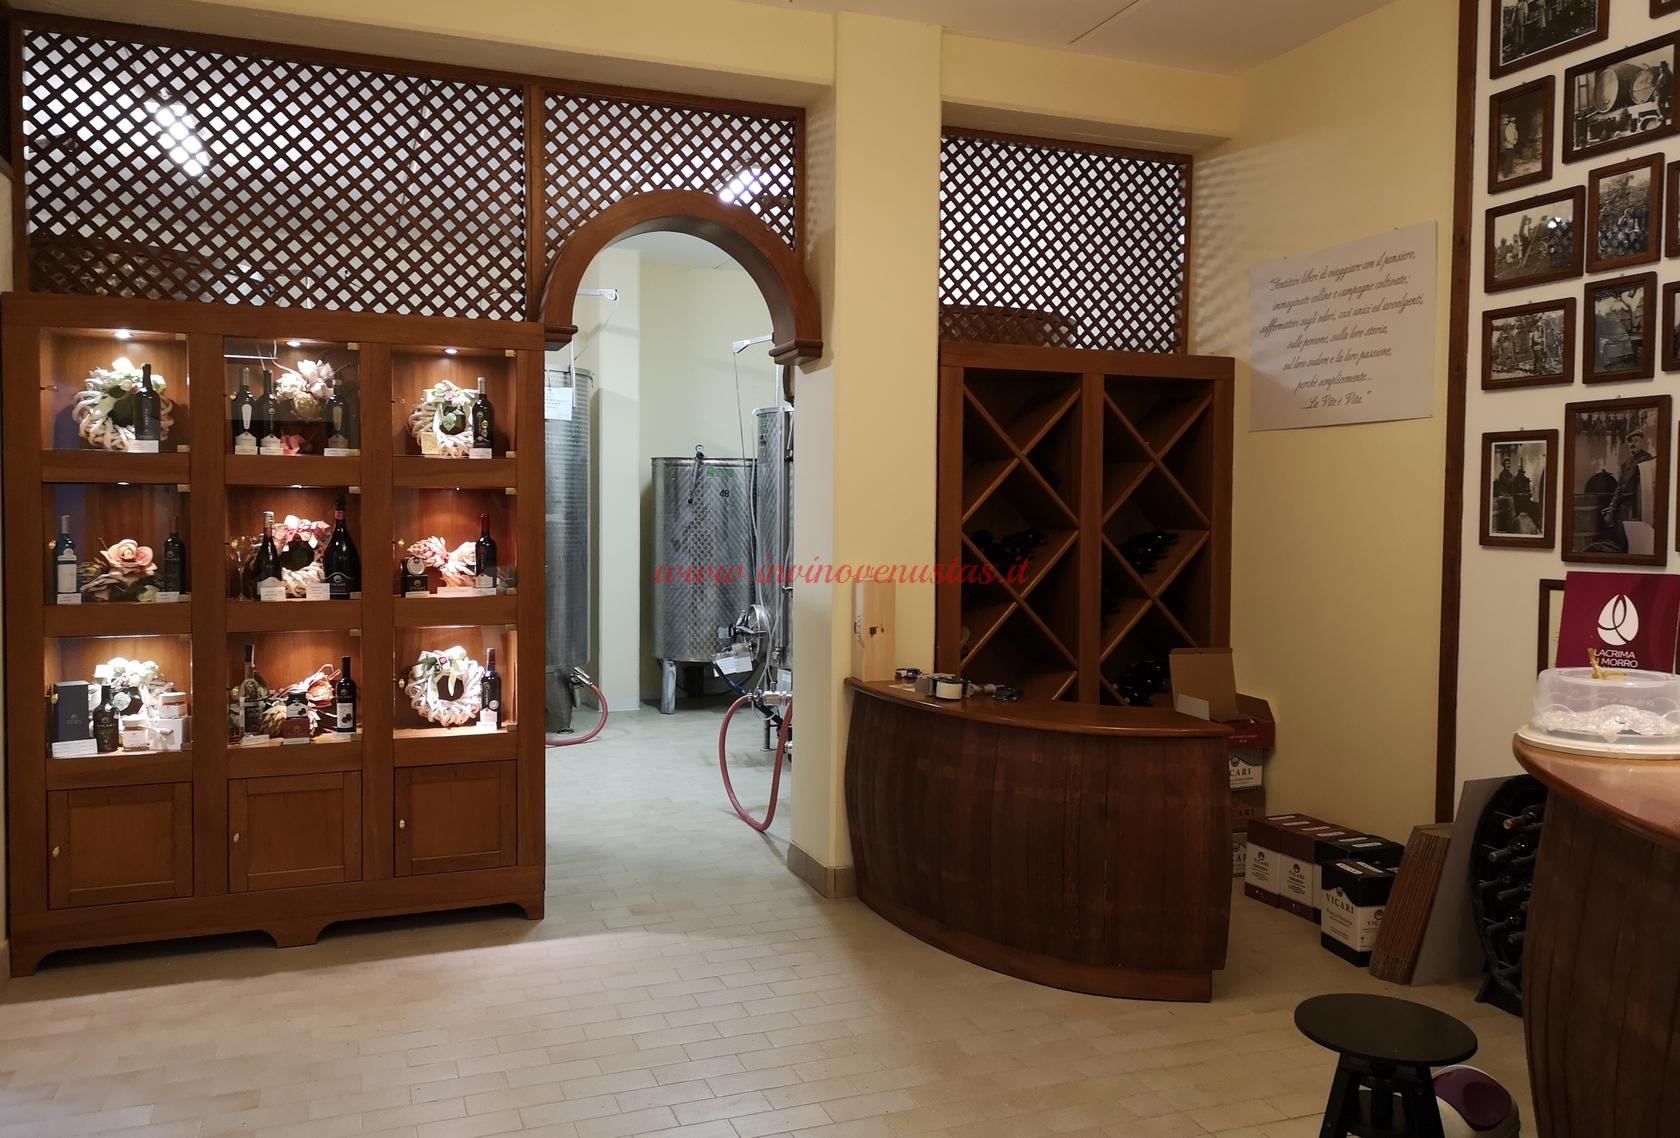 Vicari wine shop e ingresso in cantina